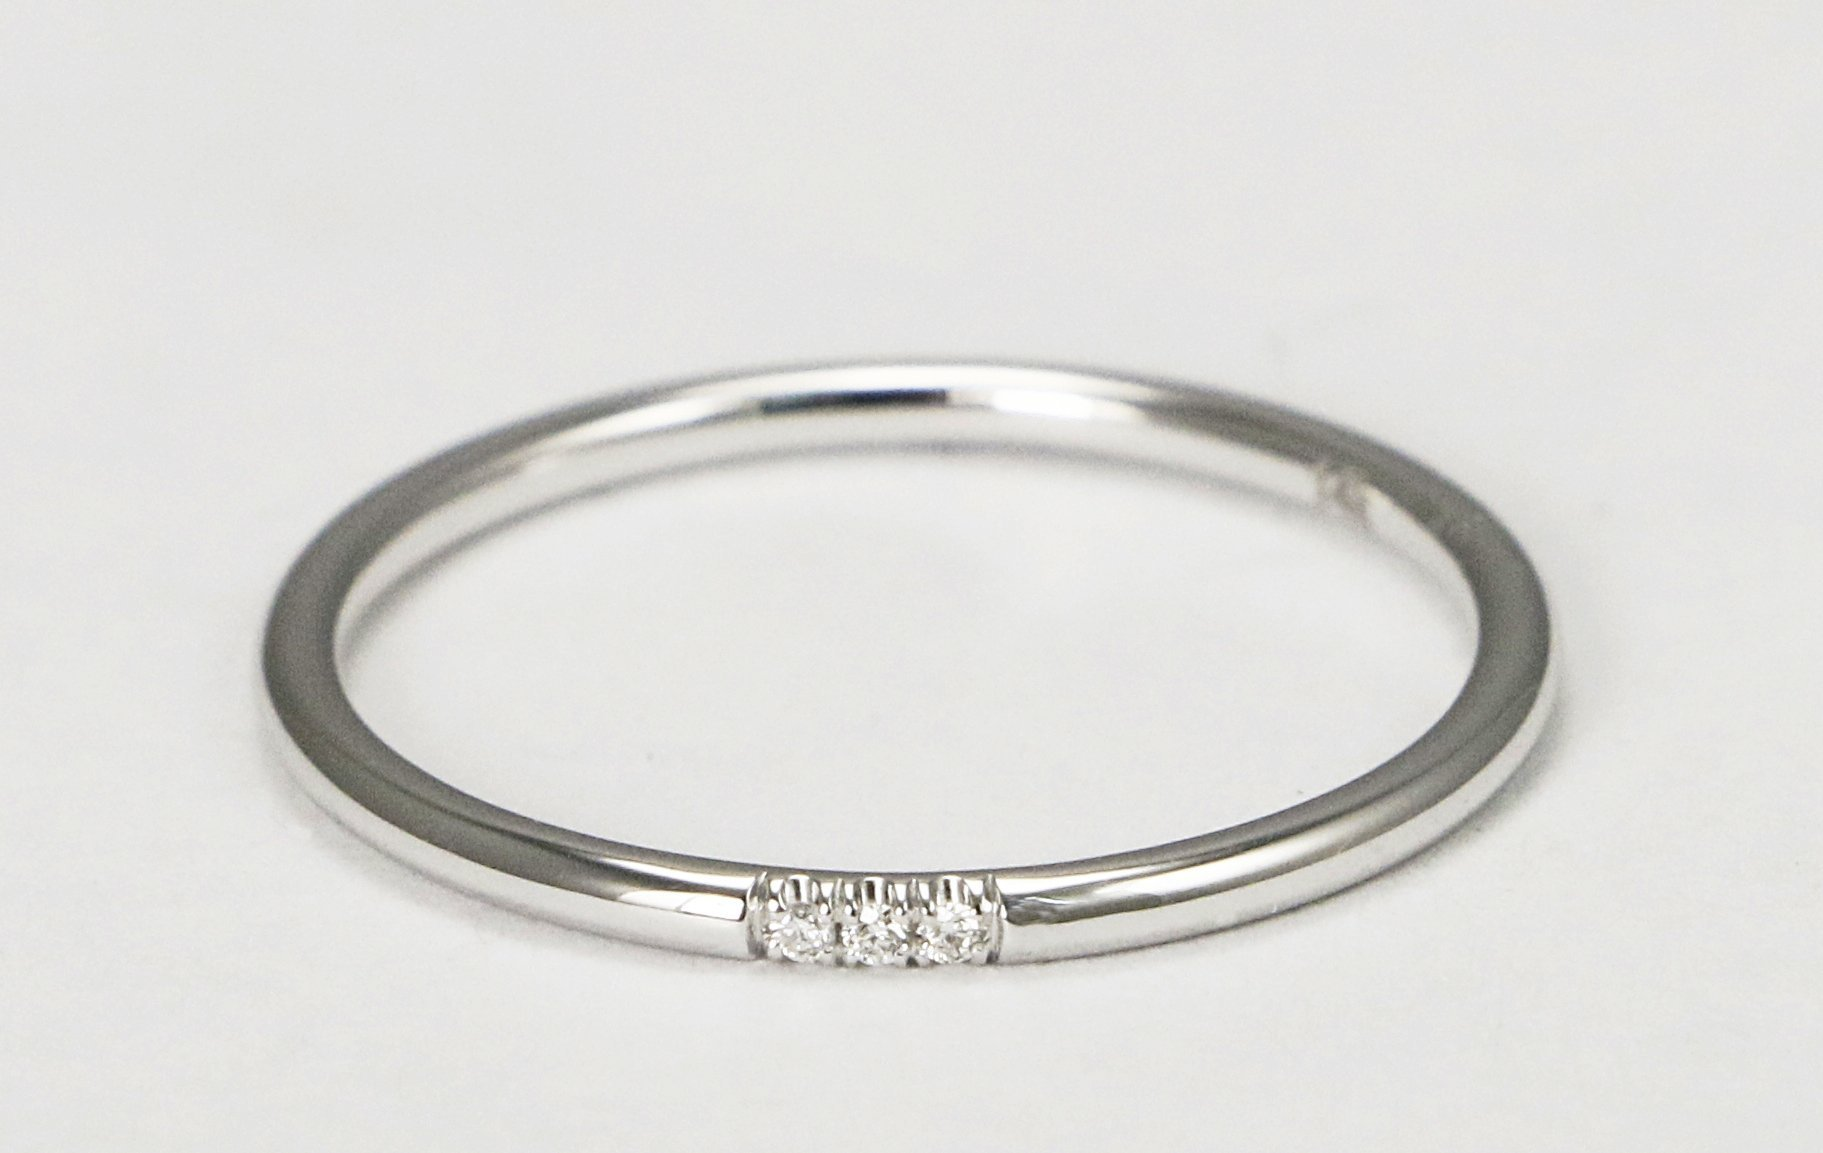 14k White Gold Diamond Wedding Band, Diamond Stacking Ring